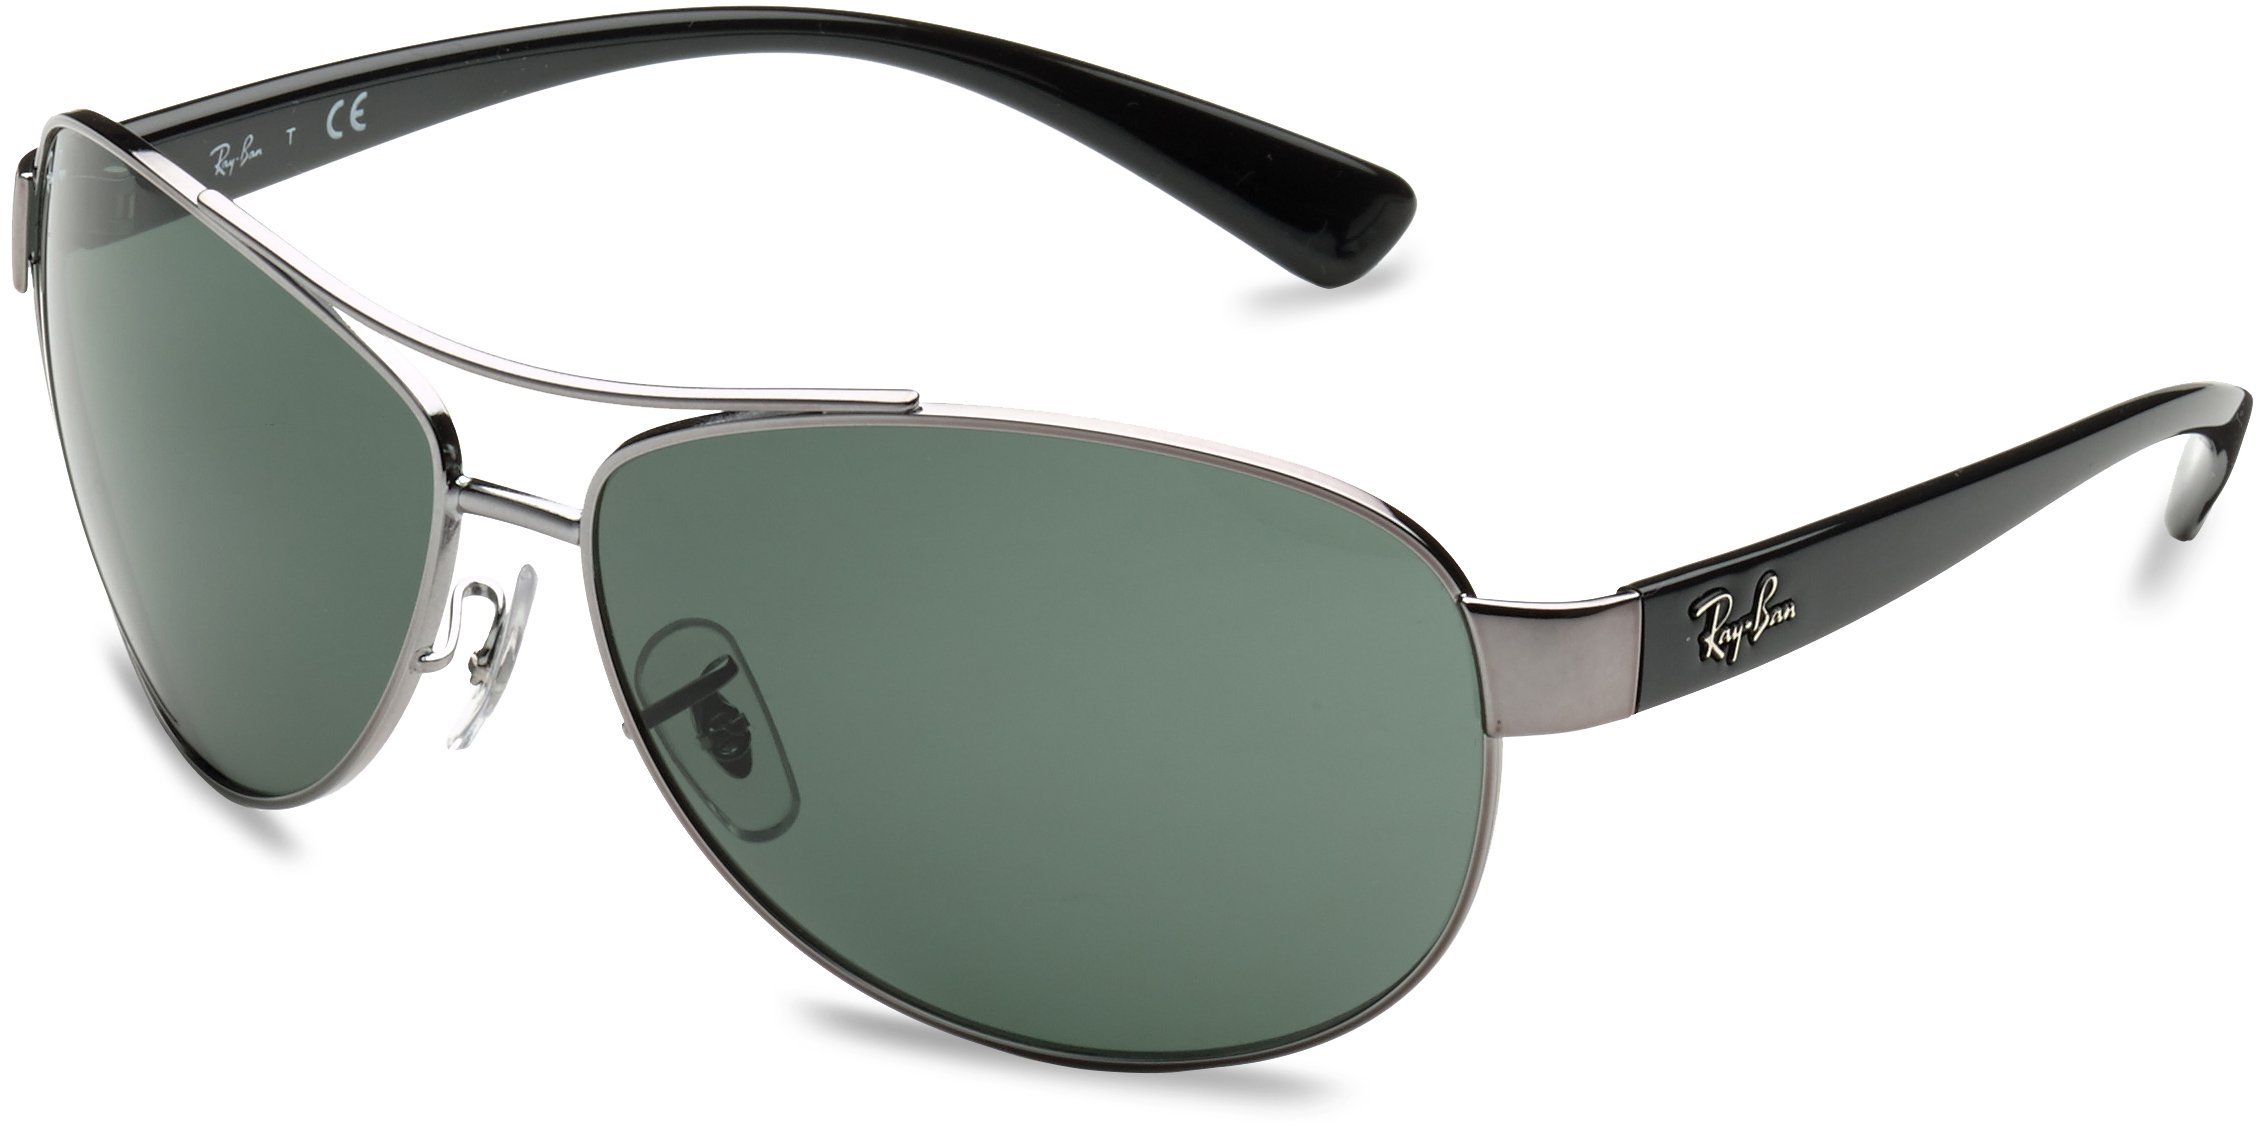 Ray-Ban RB3386 004/71 Gunmetal Sunglasses